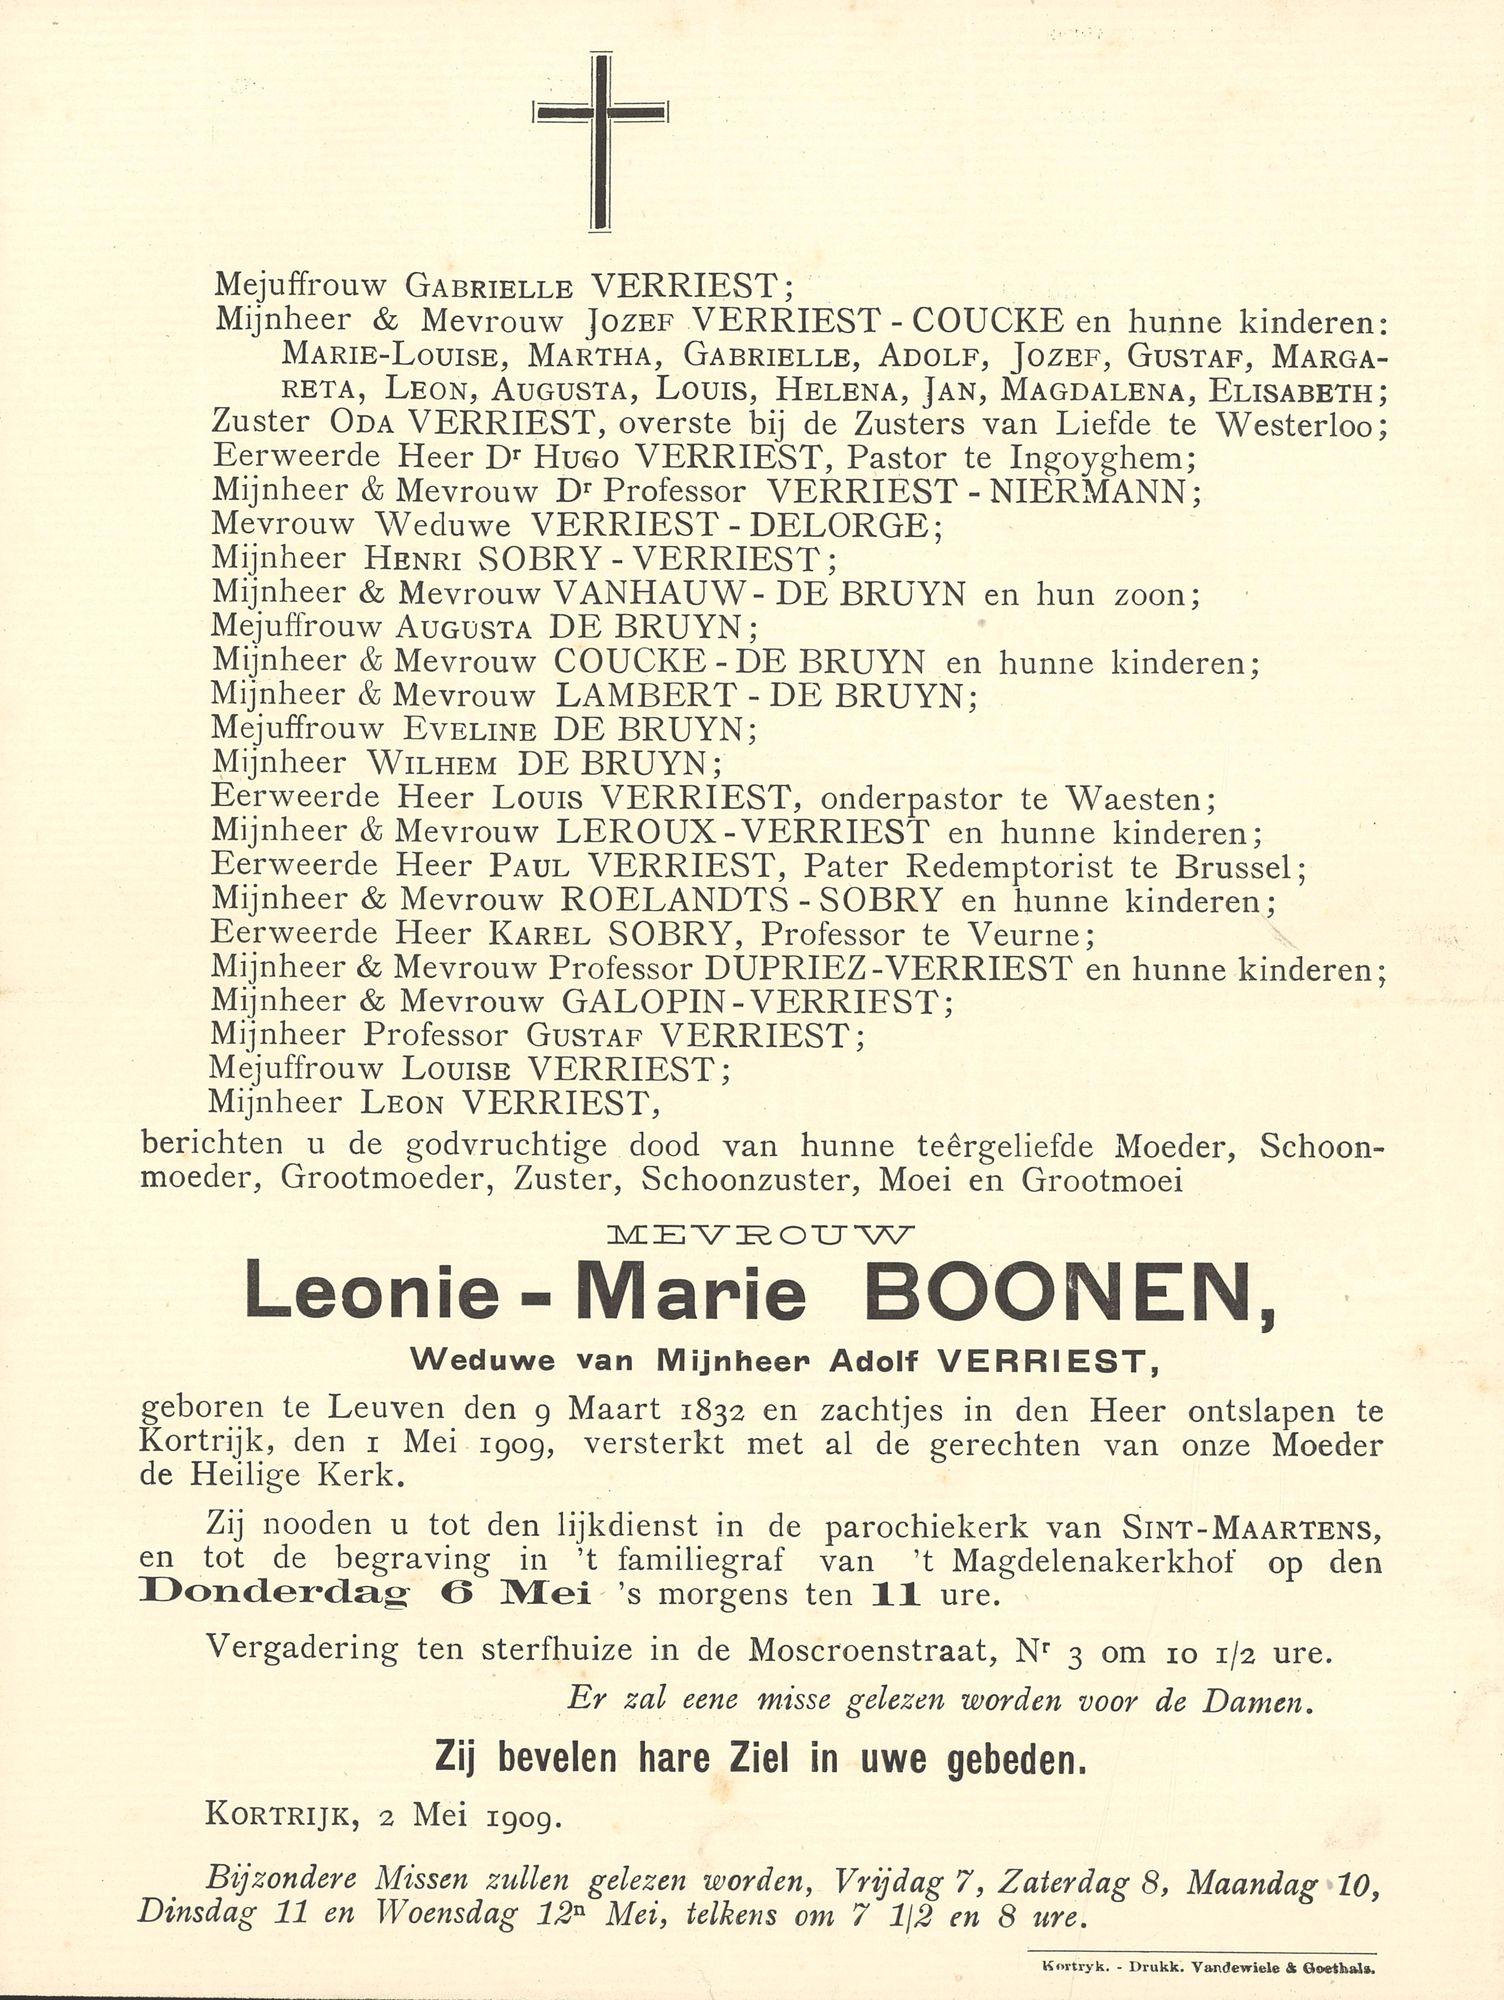 Leonie-Marie Boonen